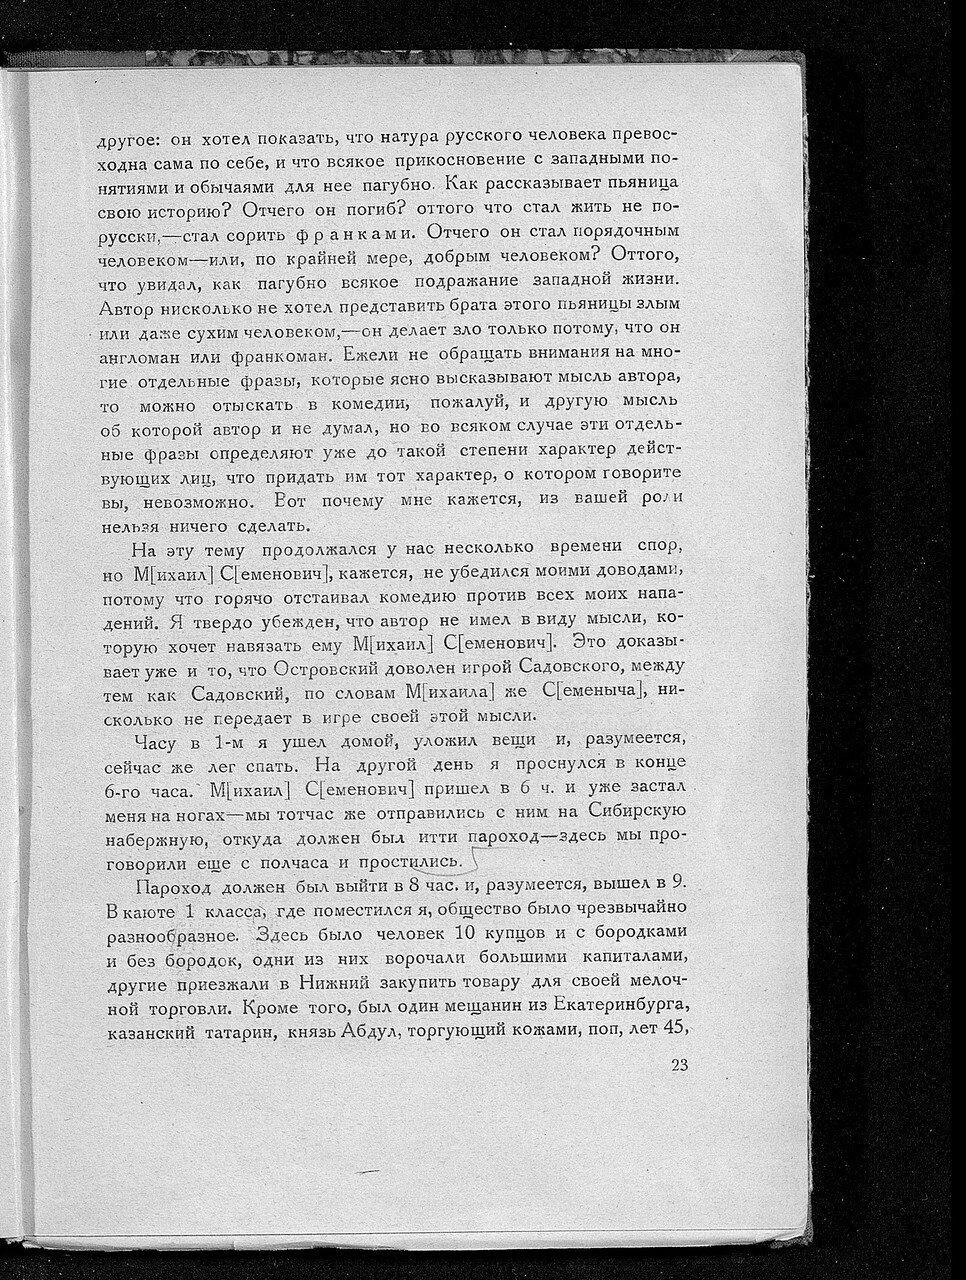 https://img-fotki.yandex.ru/get/878590/199368979.a0/0_214312_b5ce25fd_XXXL.jpg